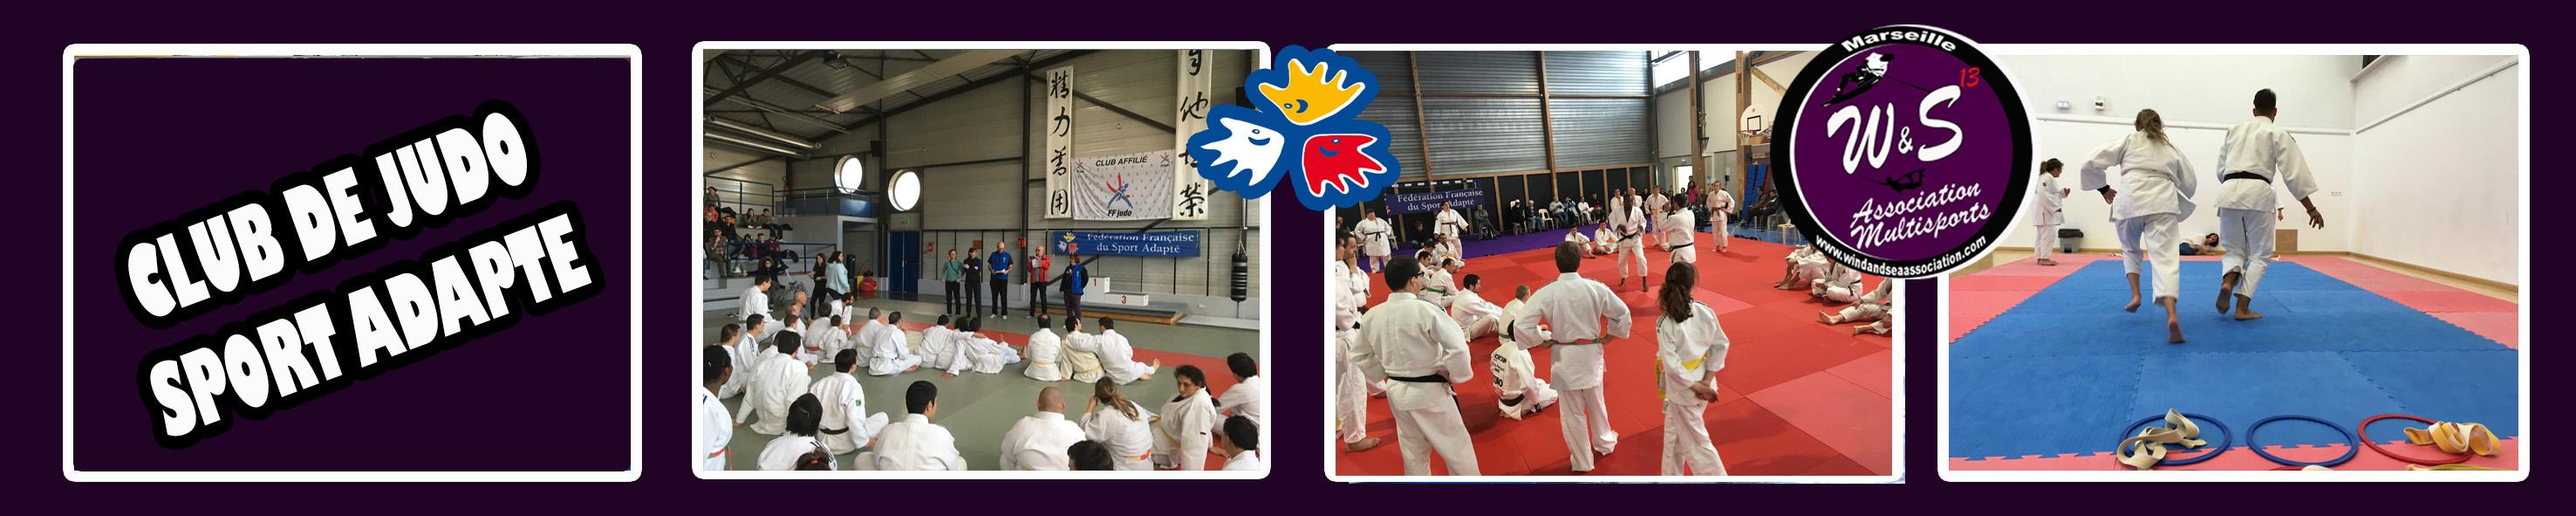 3-Le Club de Judo (1) Sport Adapté W&S